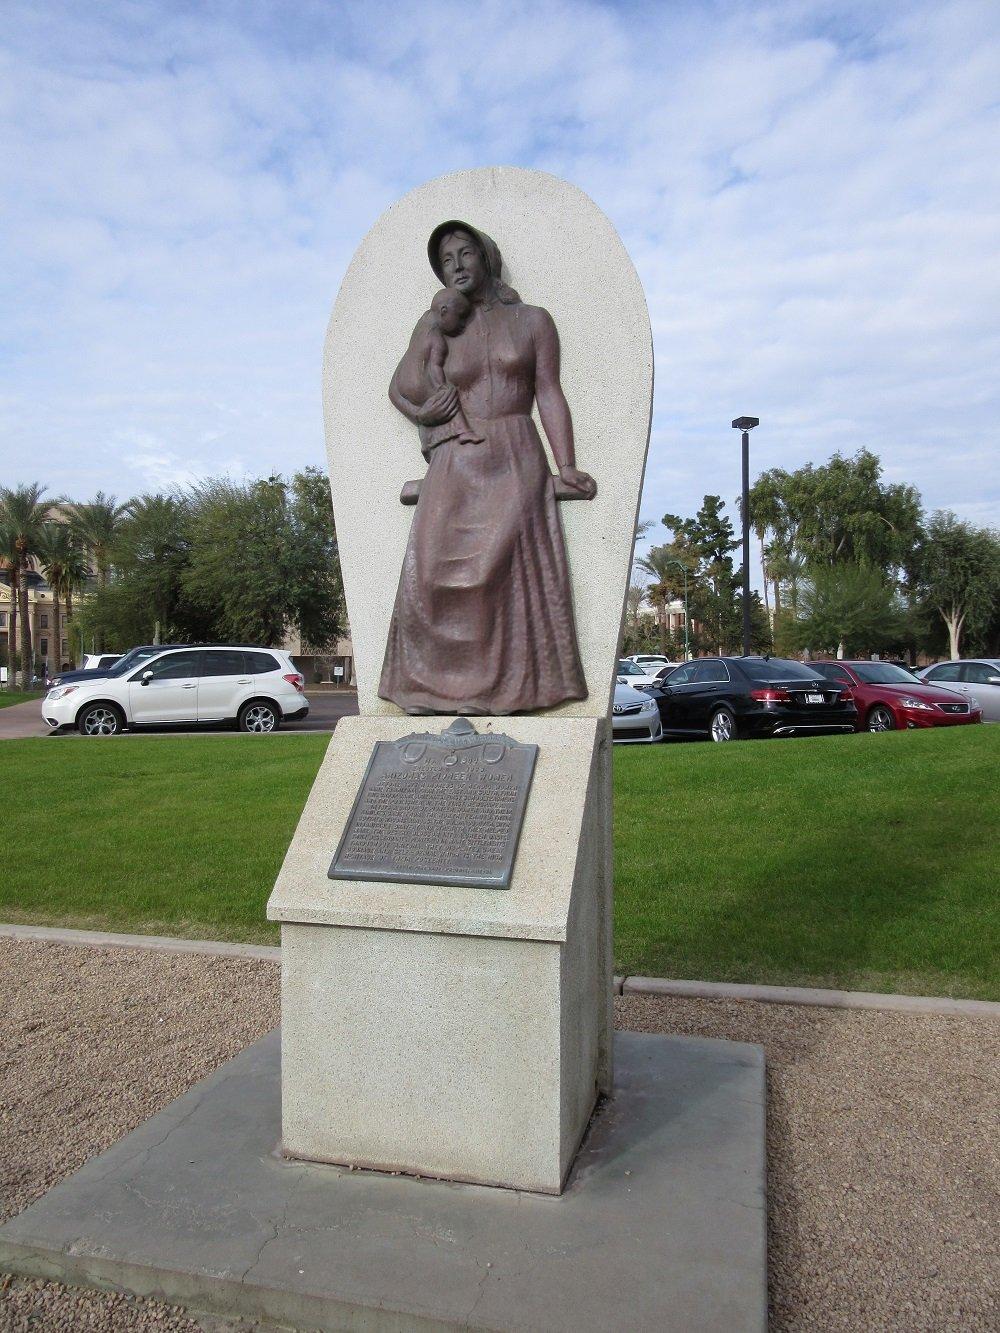 Arizona's Pioneer Women. Photo by Cynthia Prescott